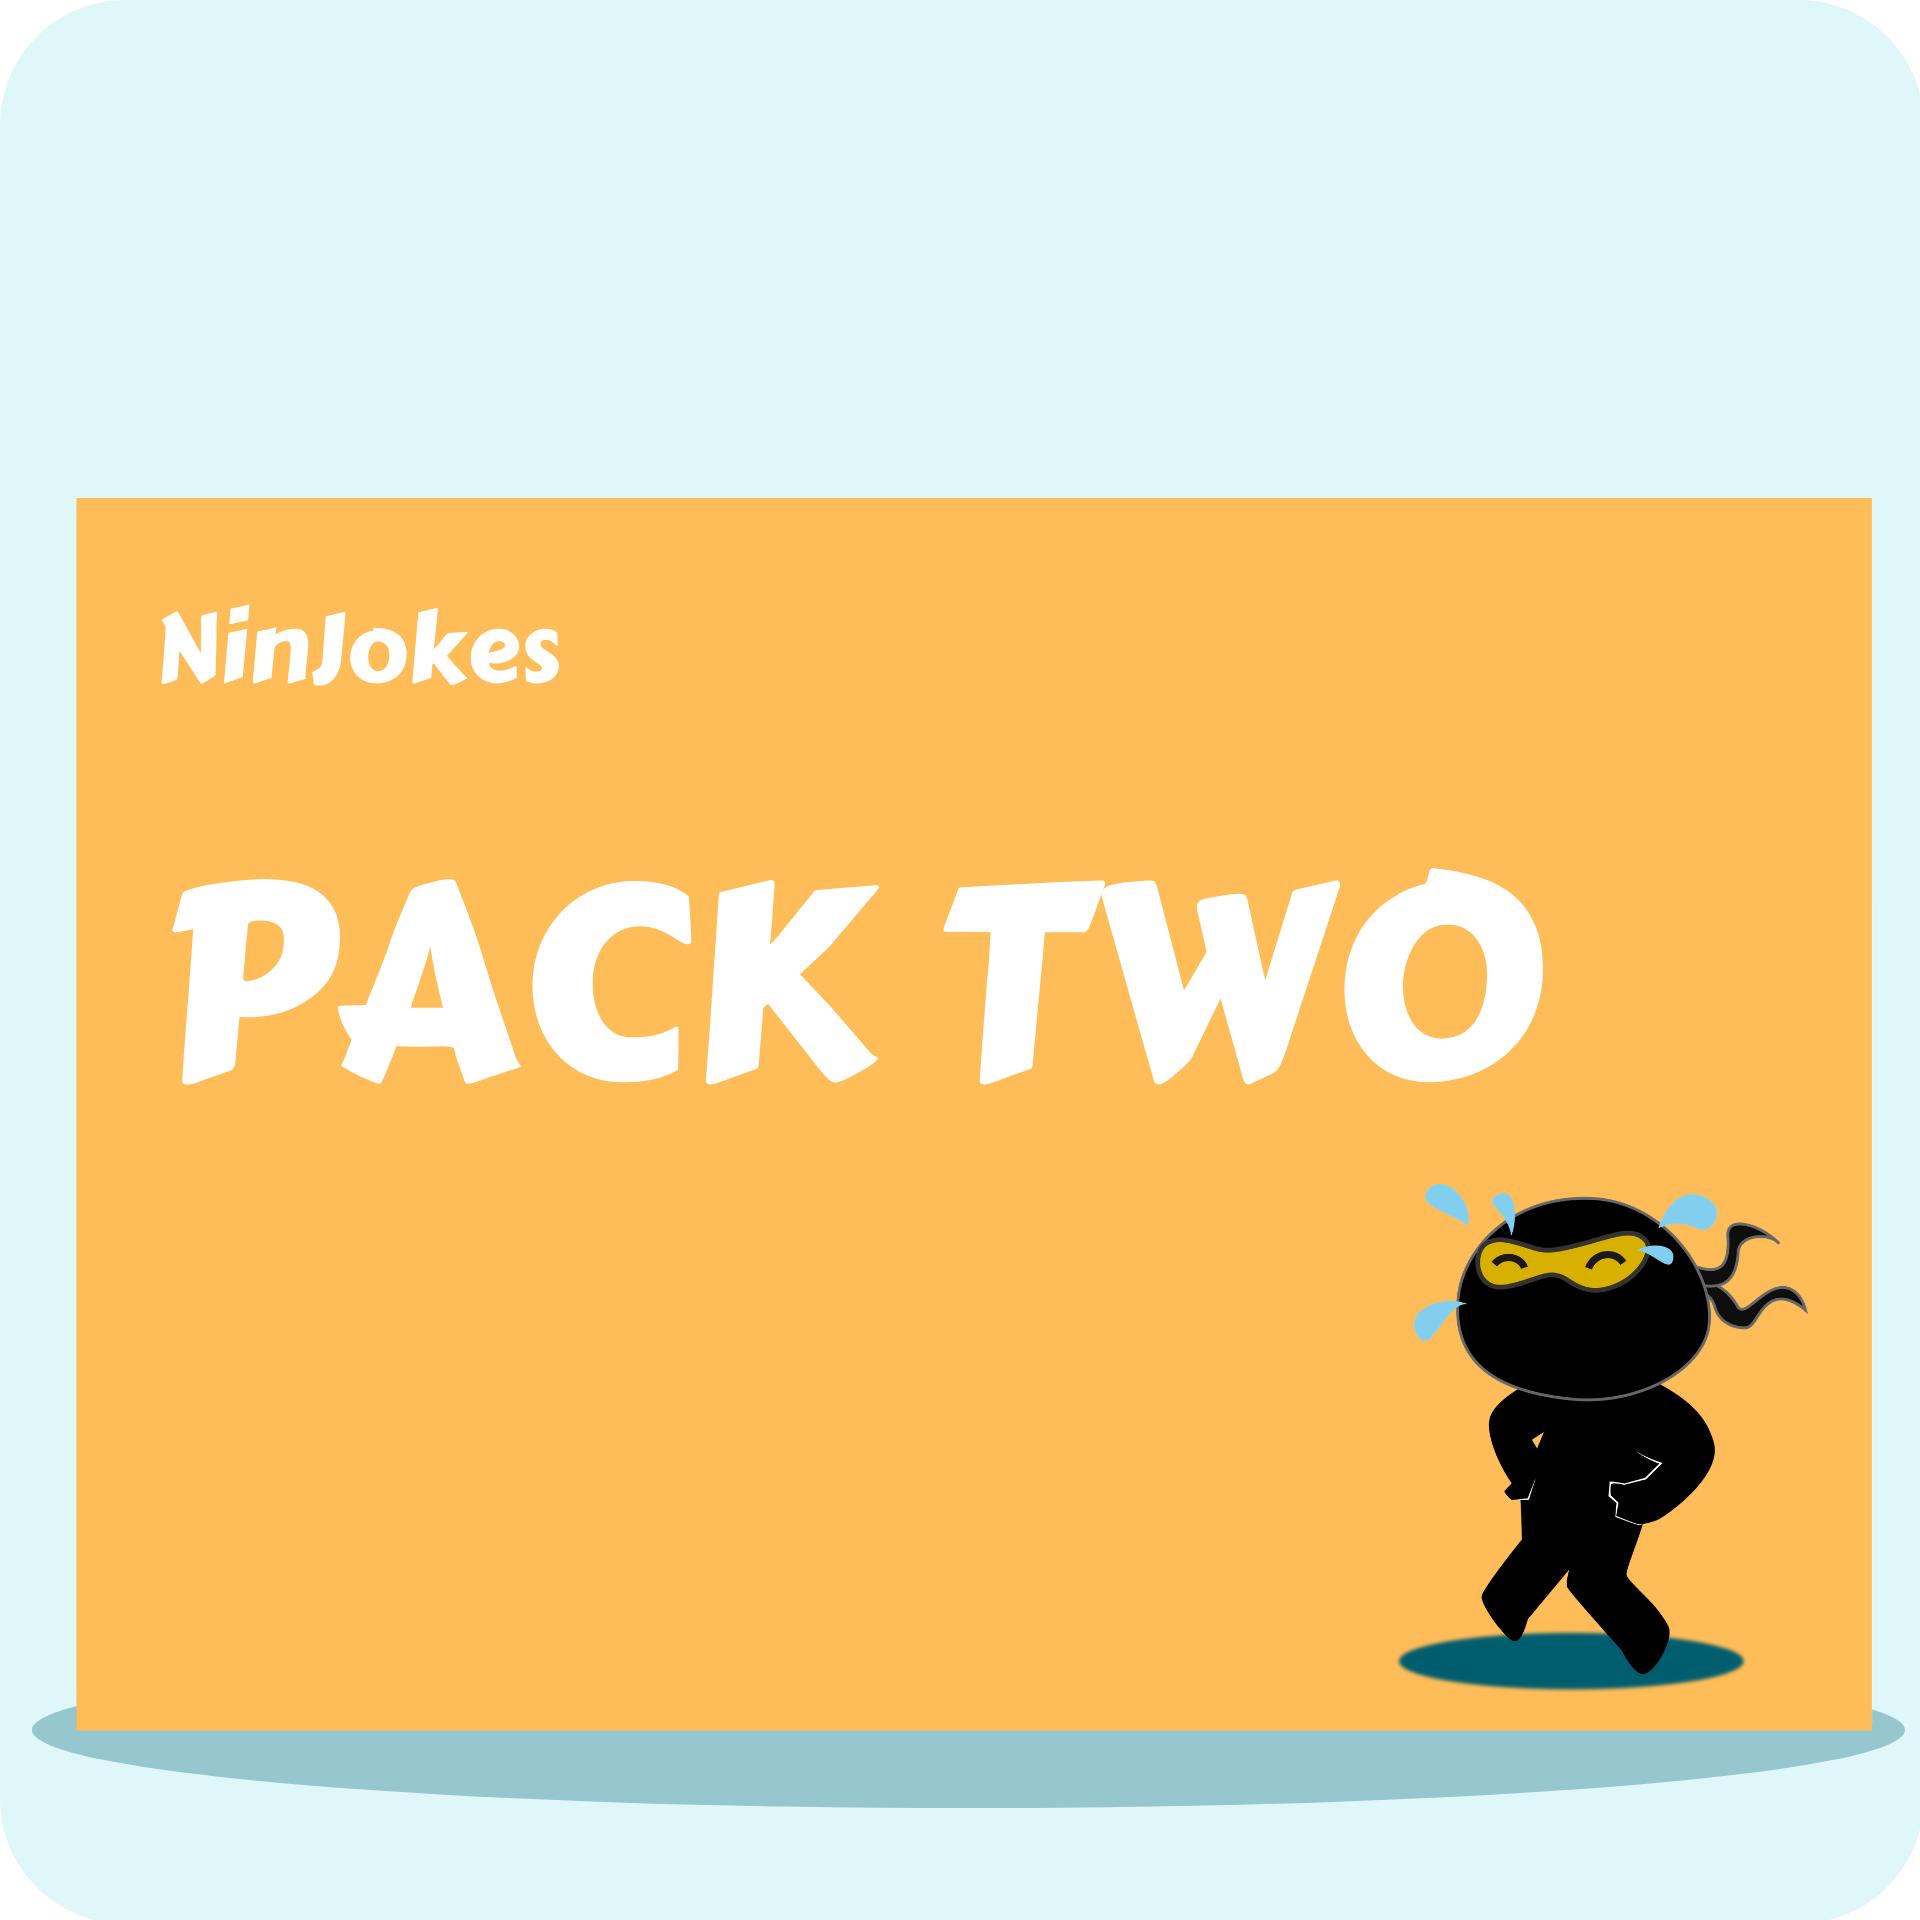 NinJokes Pack Two